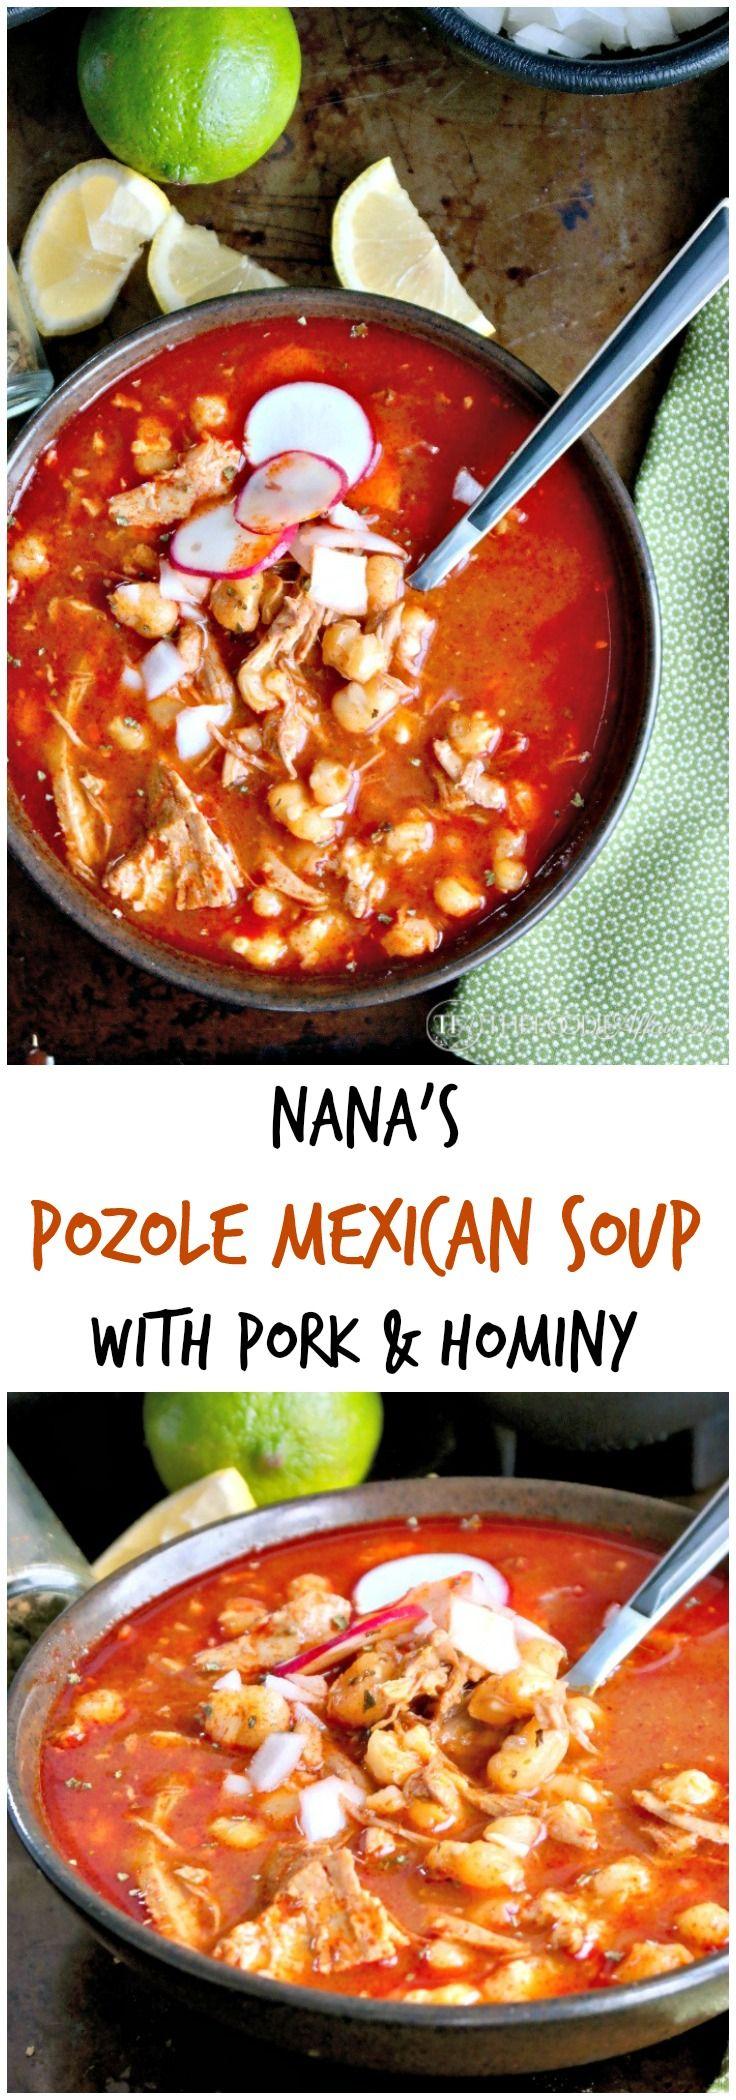 Nana's Pozole Mexican Soup #posole #soup #Mexican   thefoodieaffair.com